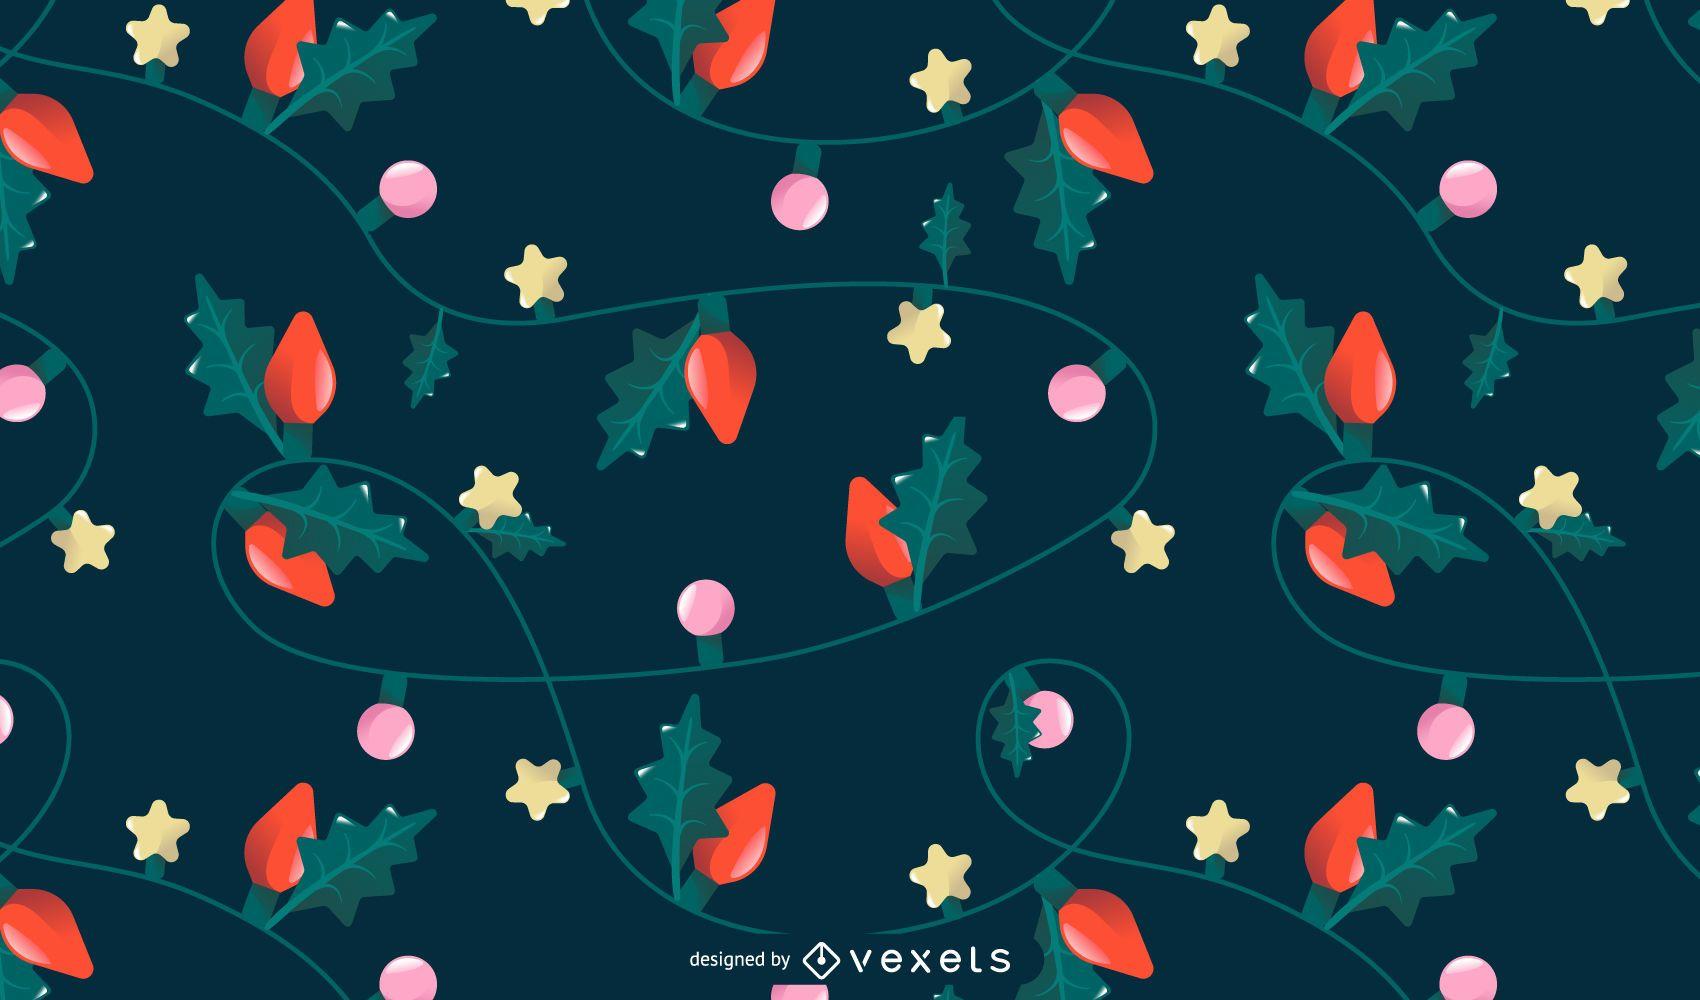 Christmas lights pattern design